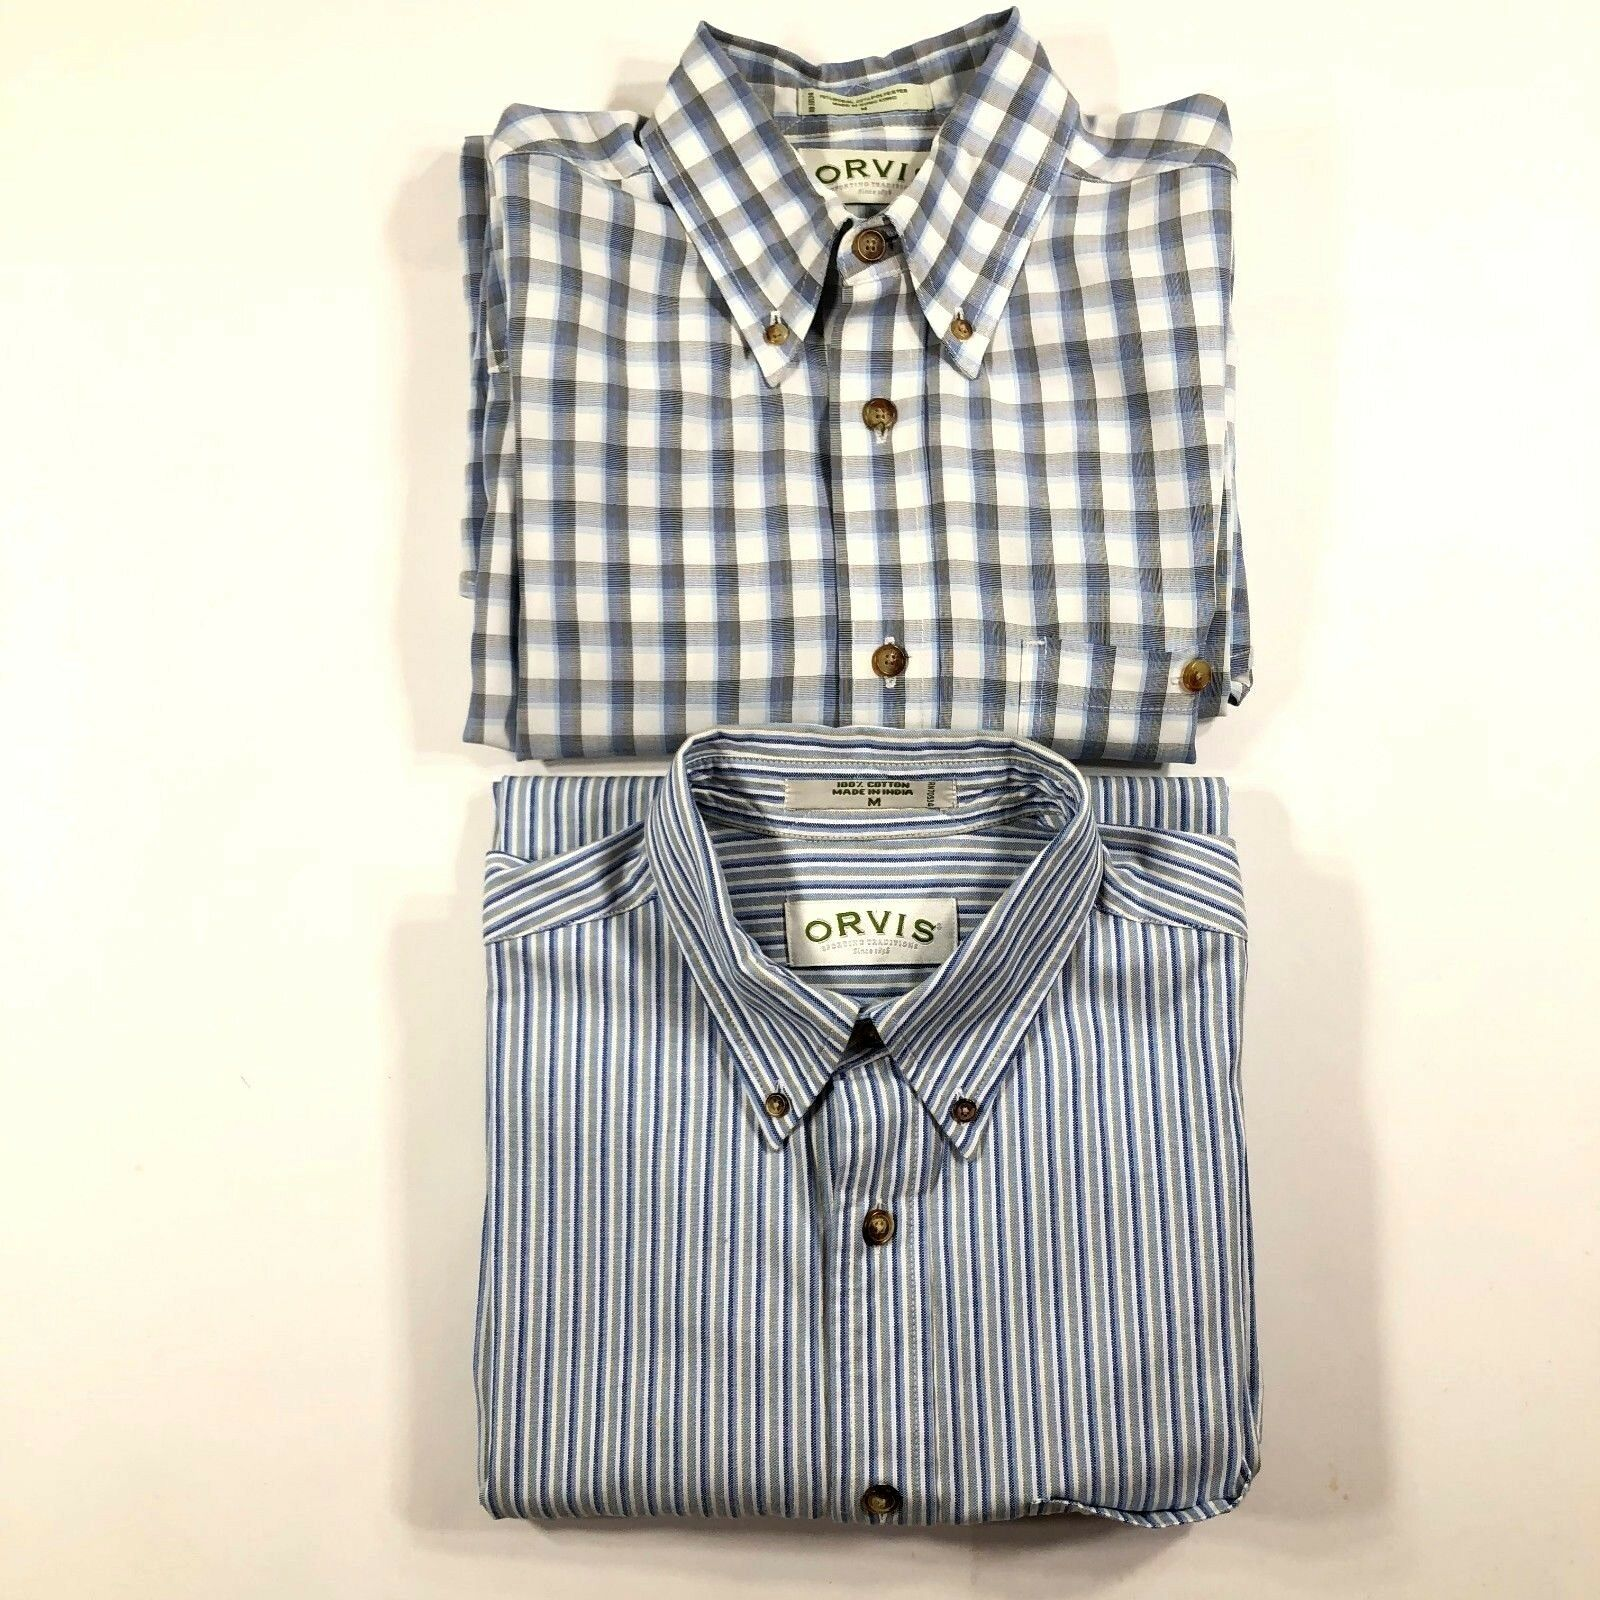 283d943dda Lof of 2 Orvis Mens M Cotton Modal Button Down Oxford Shirts L S Plaid  Striped